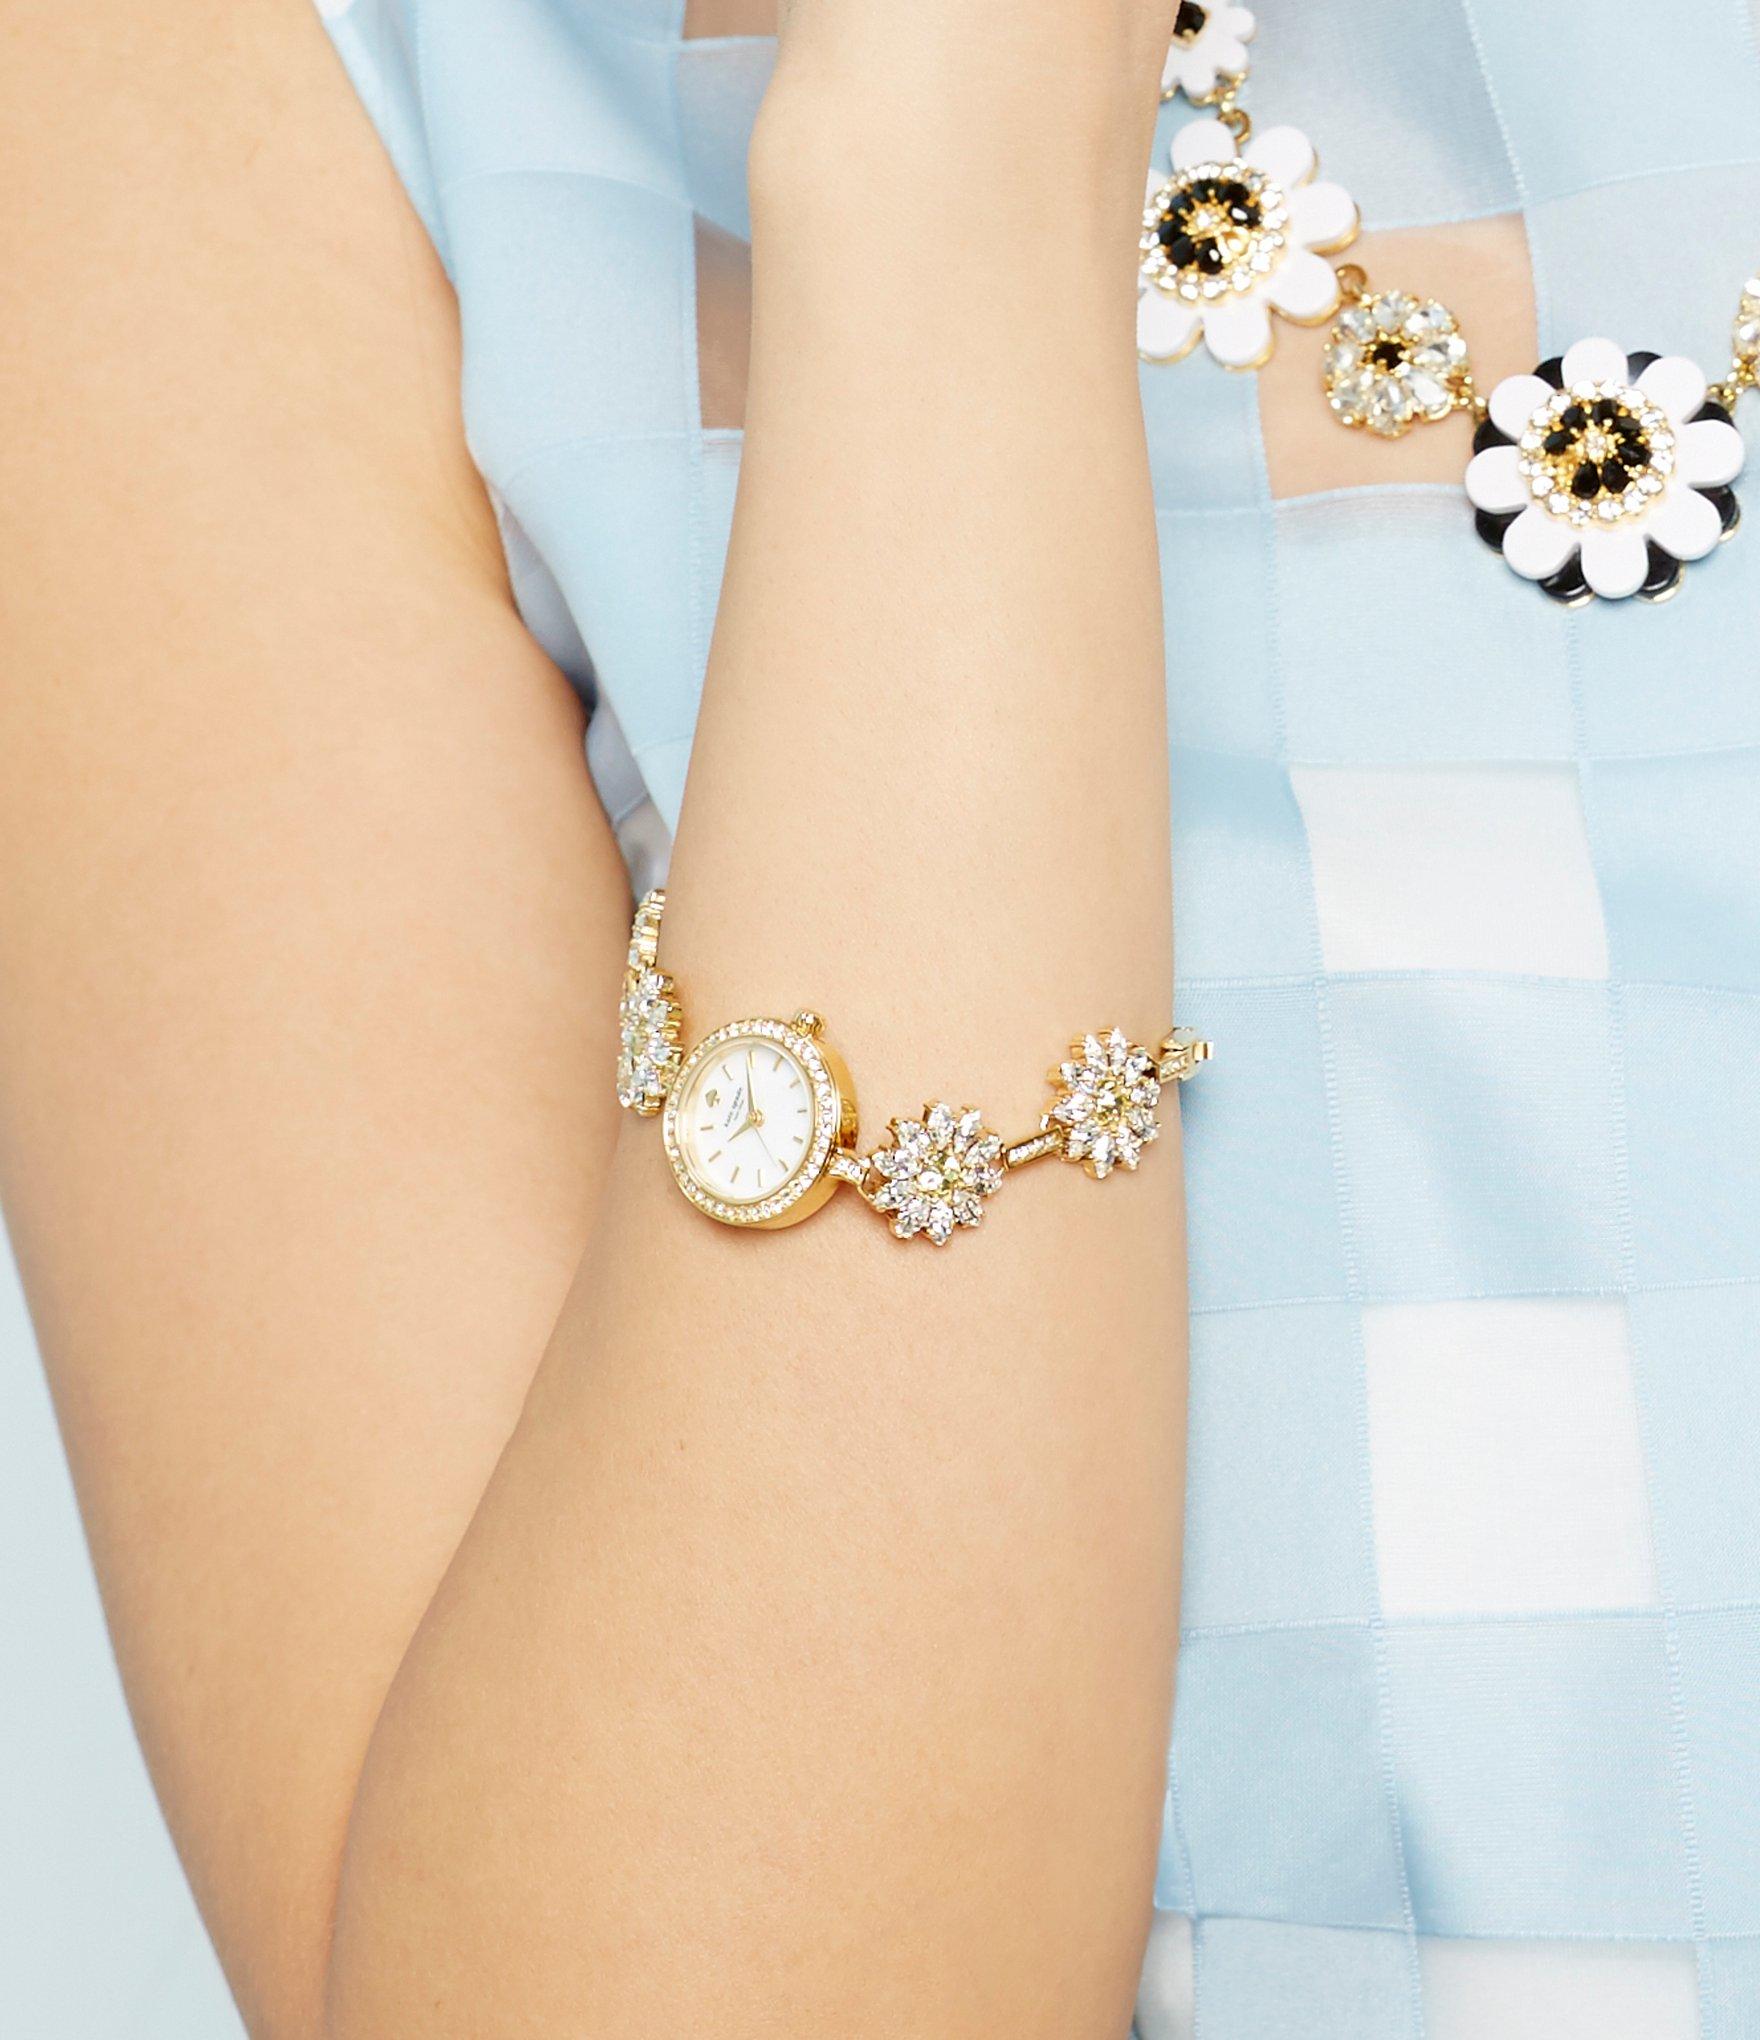 Daisy Chain Bracelet Watch